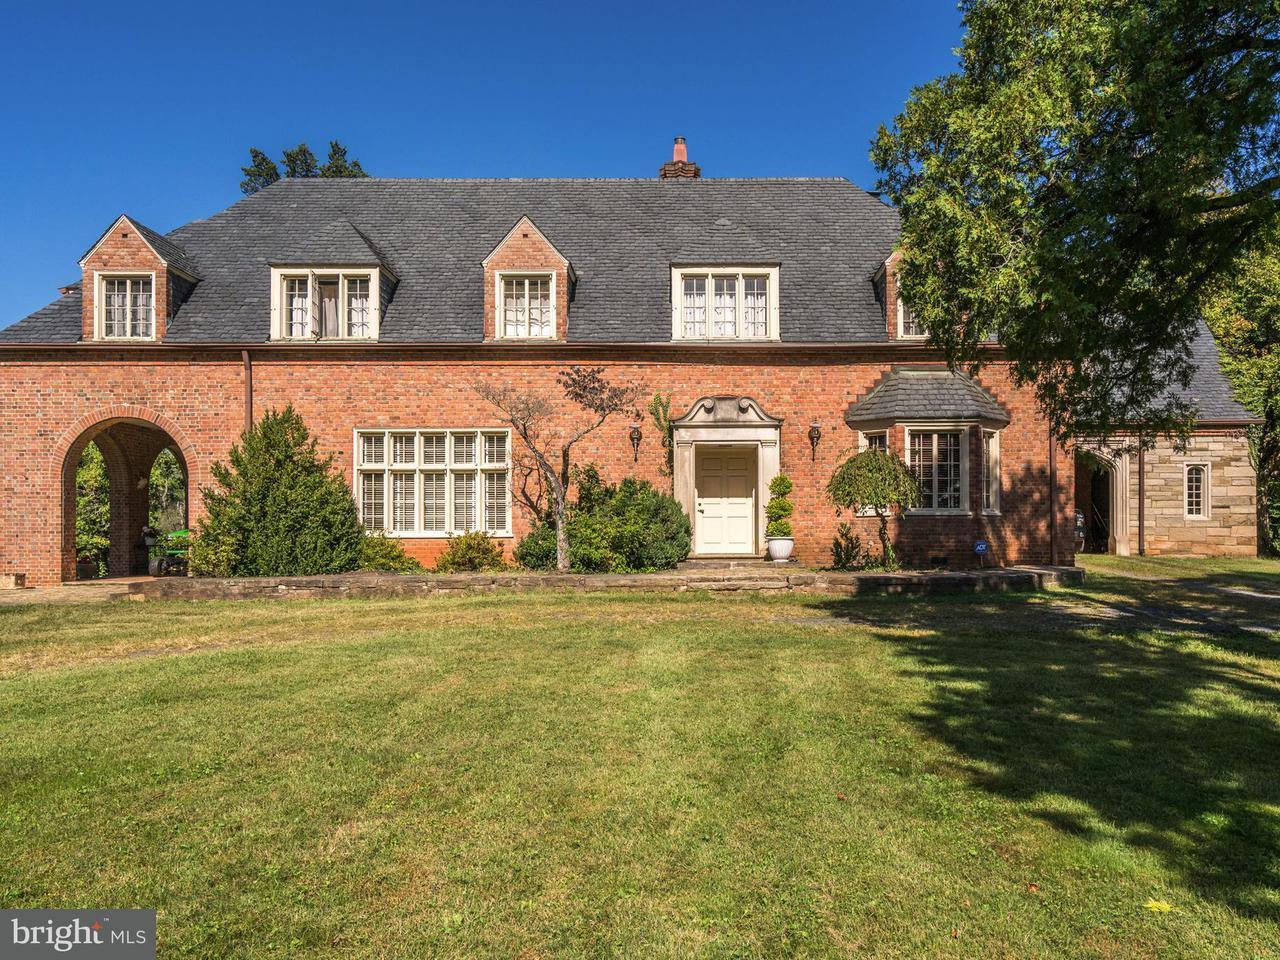 Additional photo for property listing at 6016 Lee Hwy 6016 Lee Hwy Warrenton, Virginia 20187 Stati Uniti